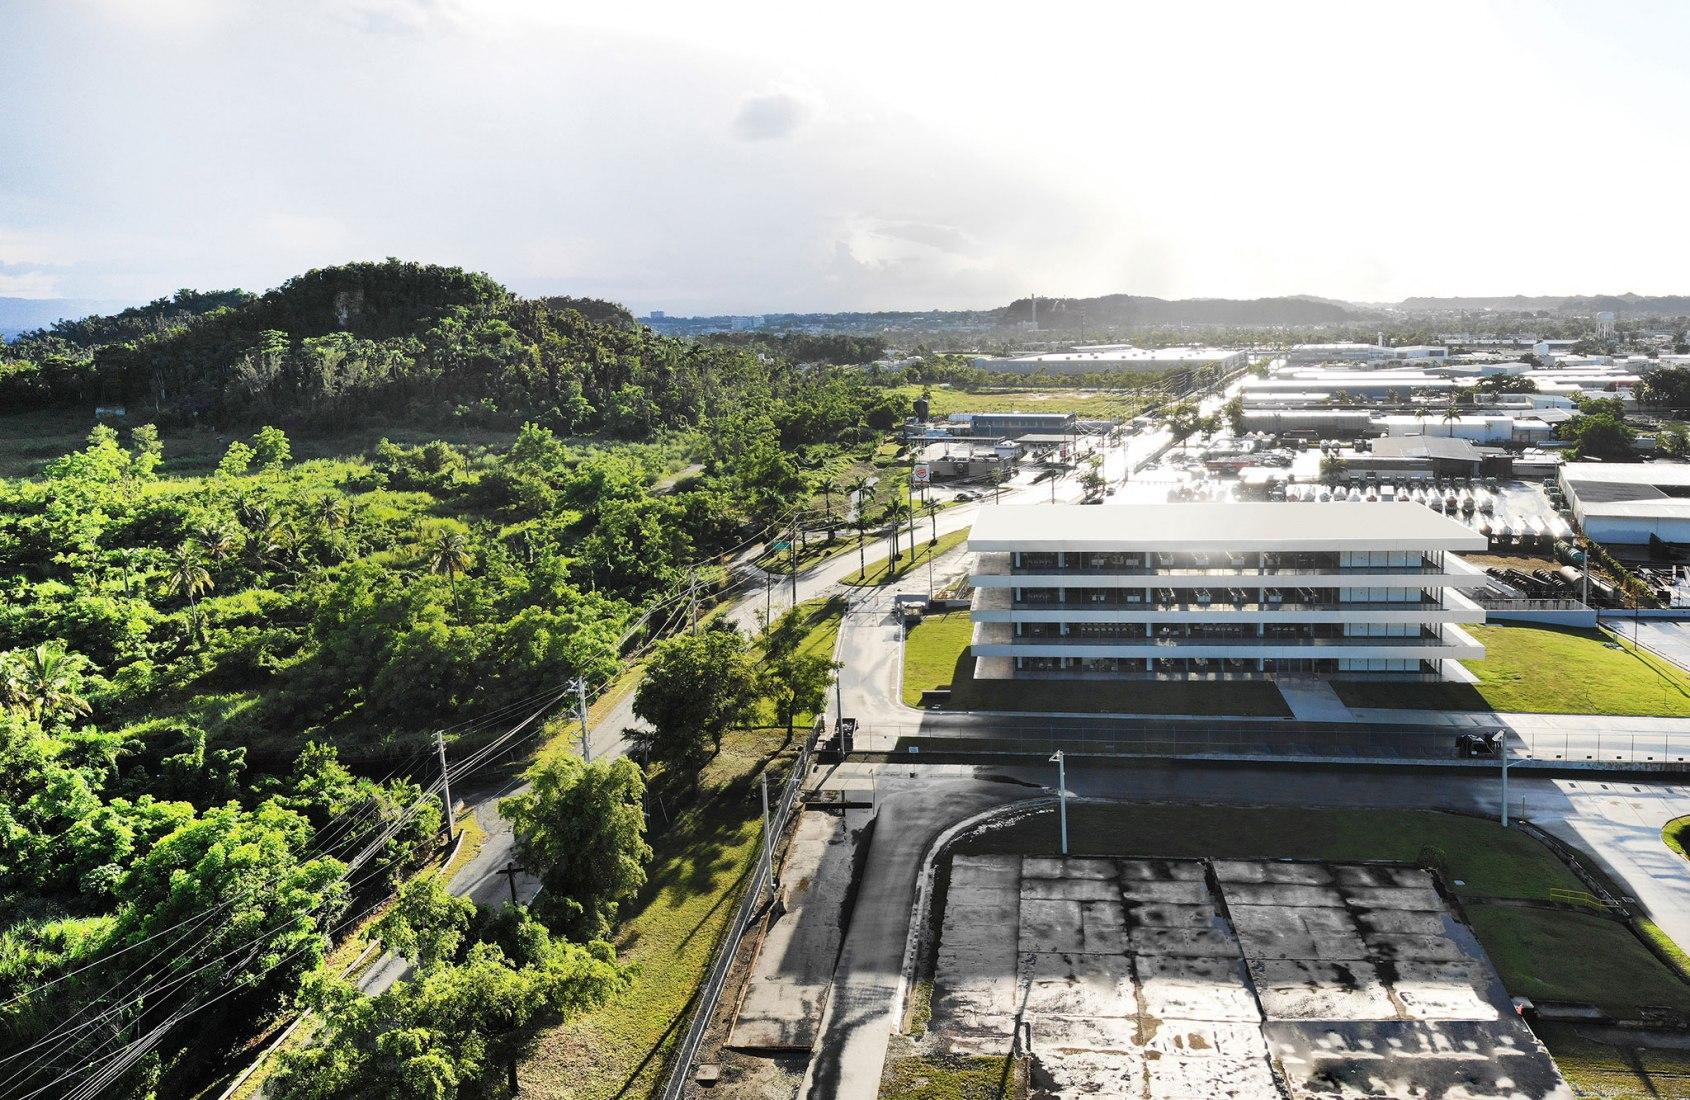 Puma Energy America Regional Headquarters by Ruiz Pardo – Nebreda. Photograph by Jesús Granada